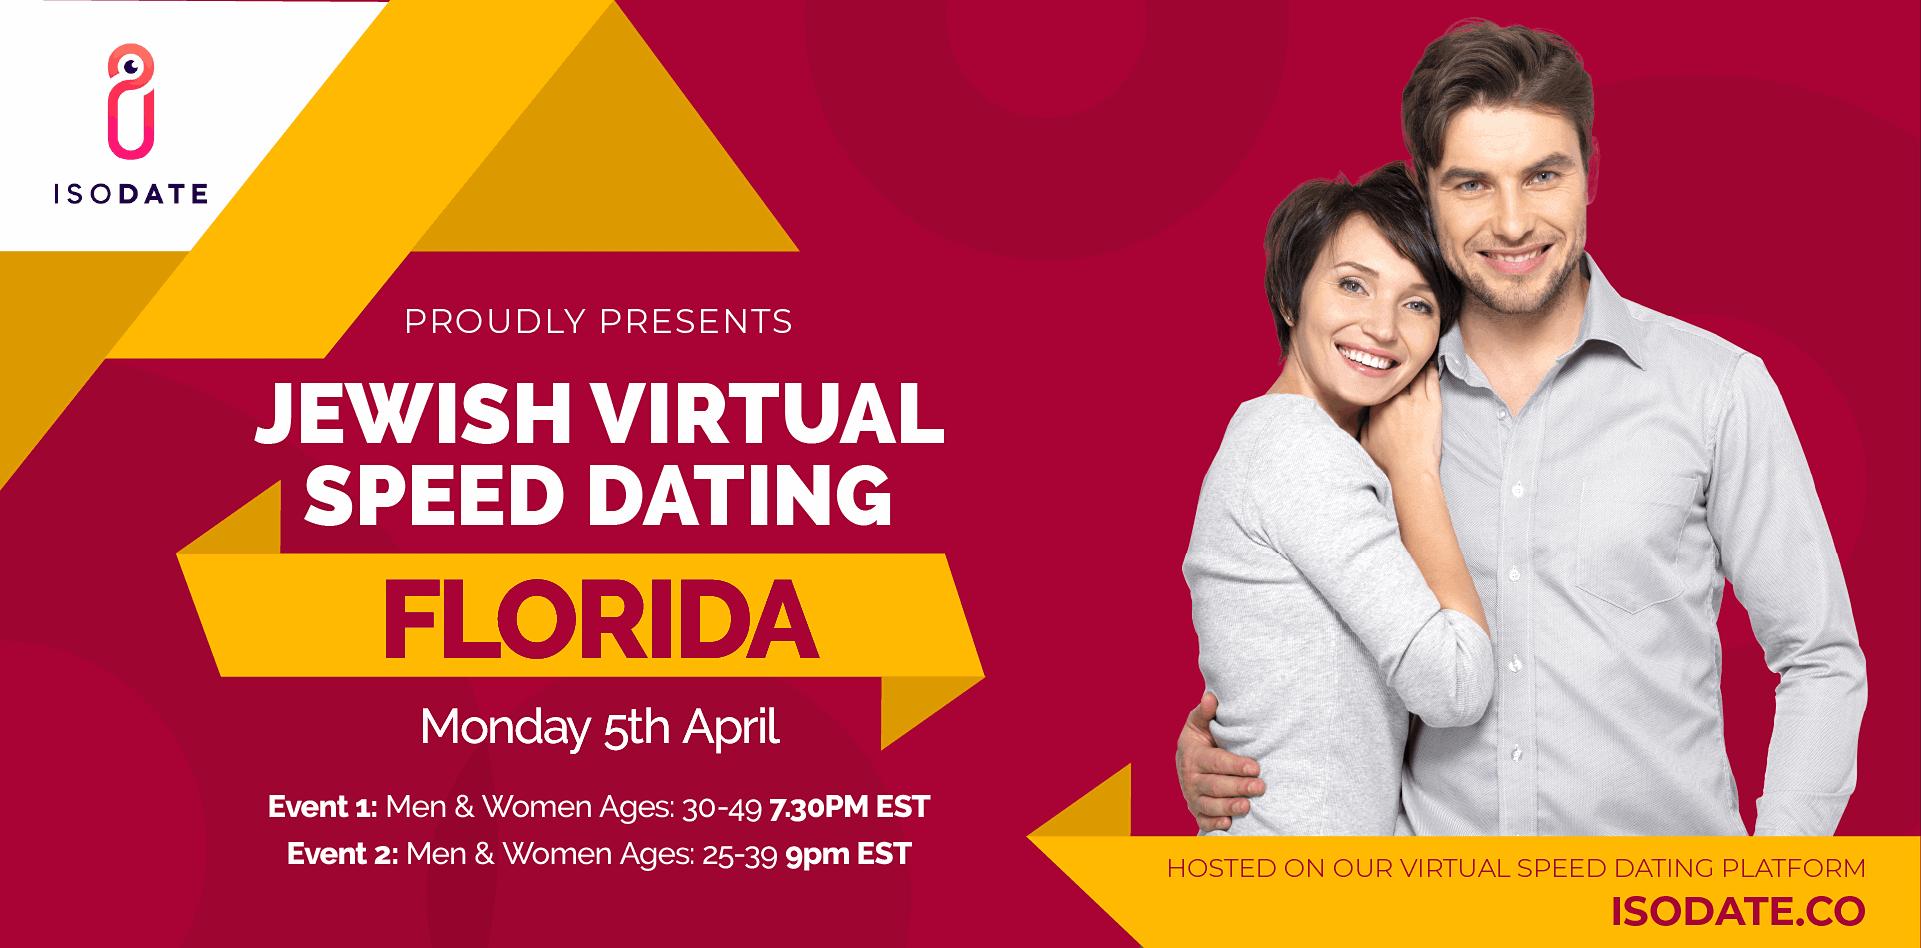 Isodate's Florida Jewish Virtual Speed Dating - Swipe Less, Date More